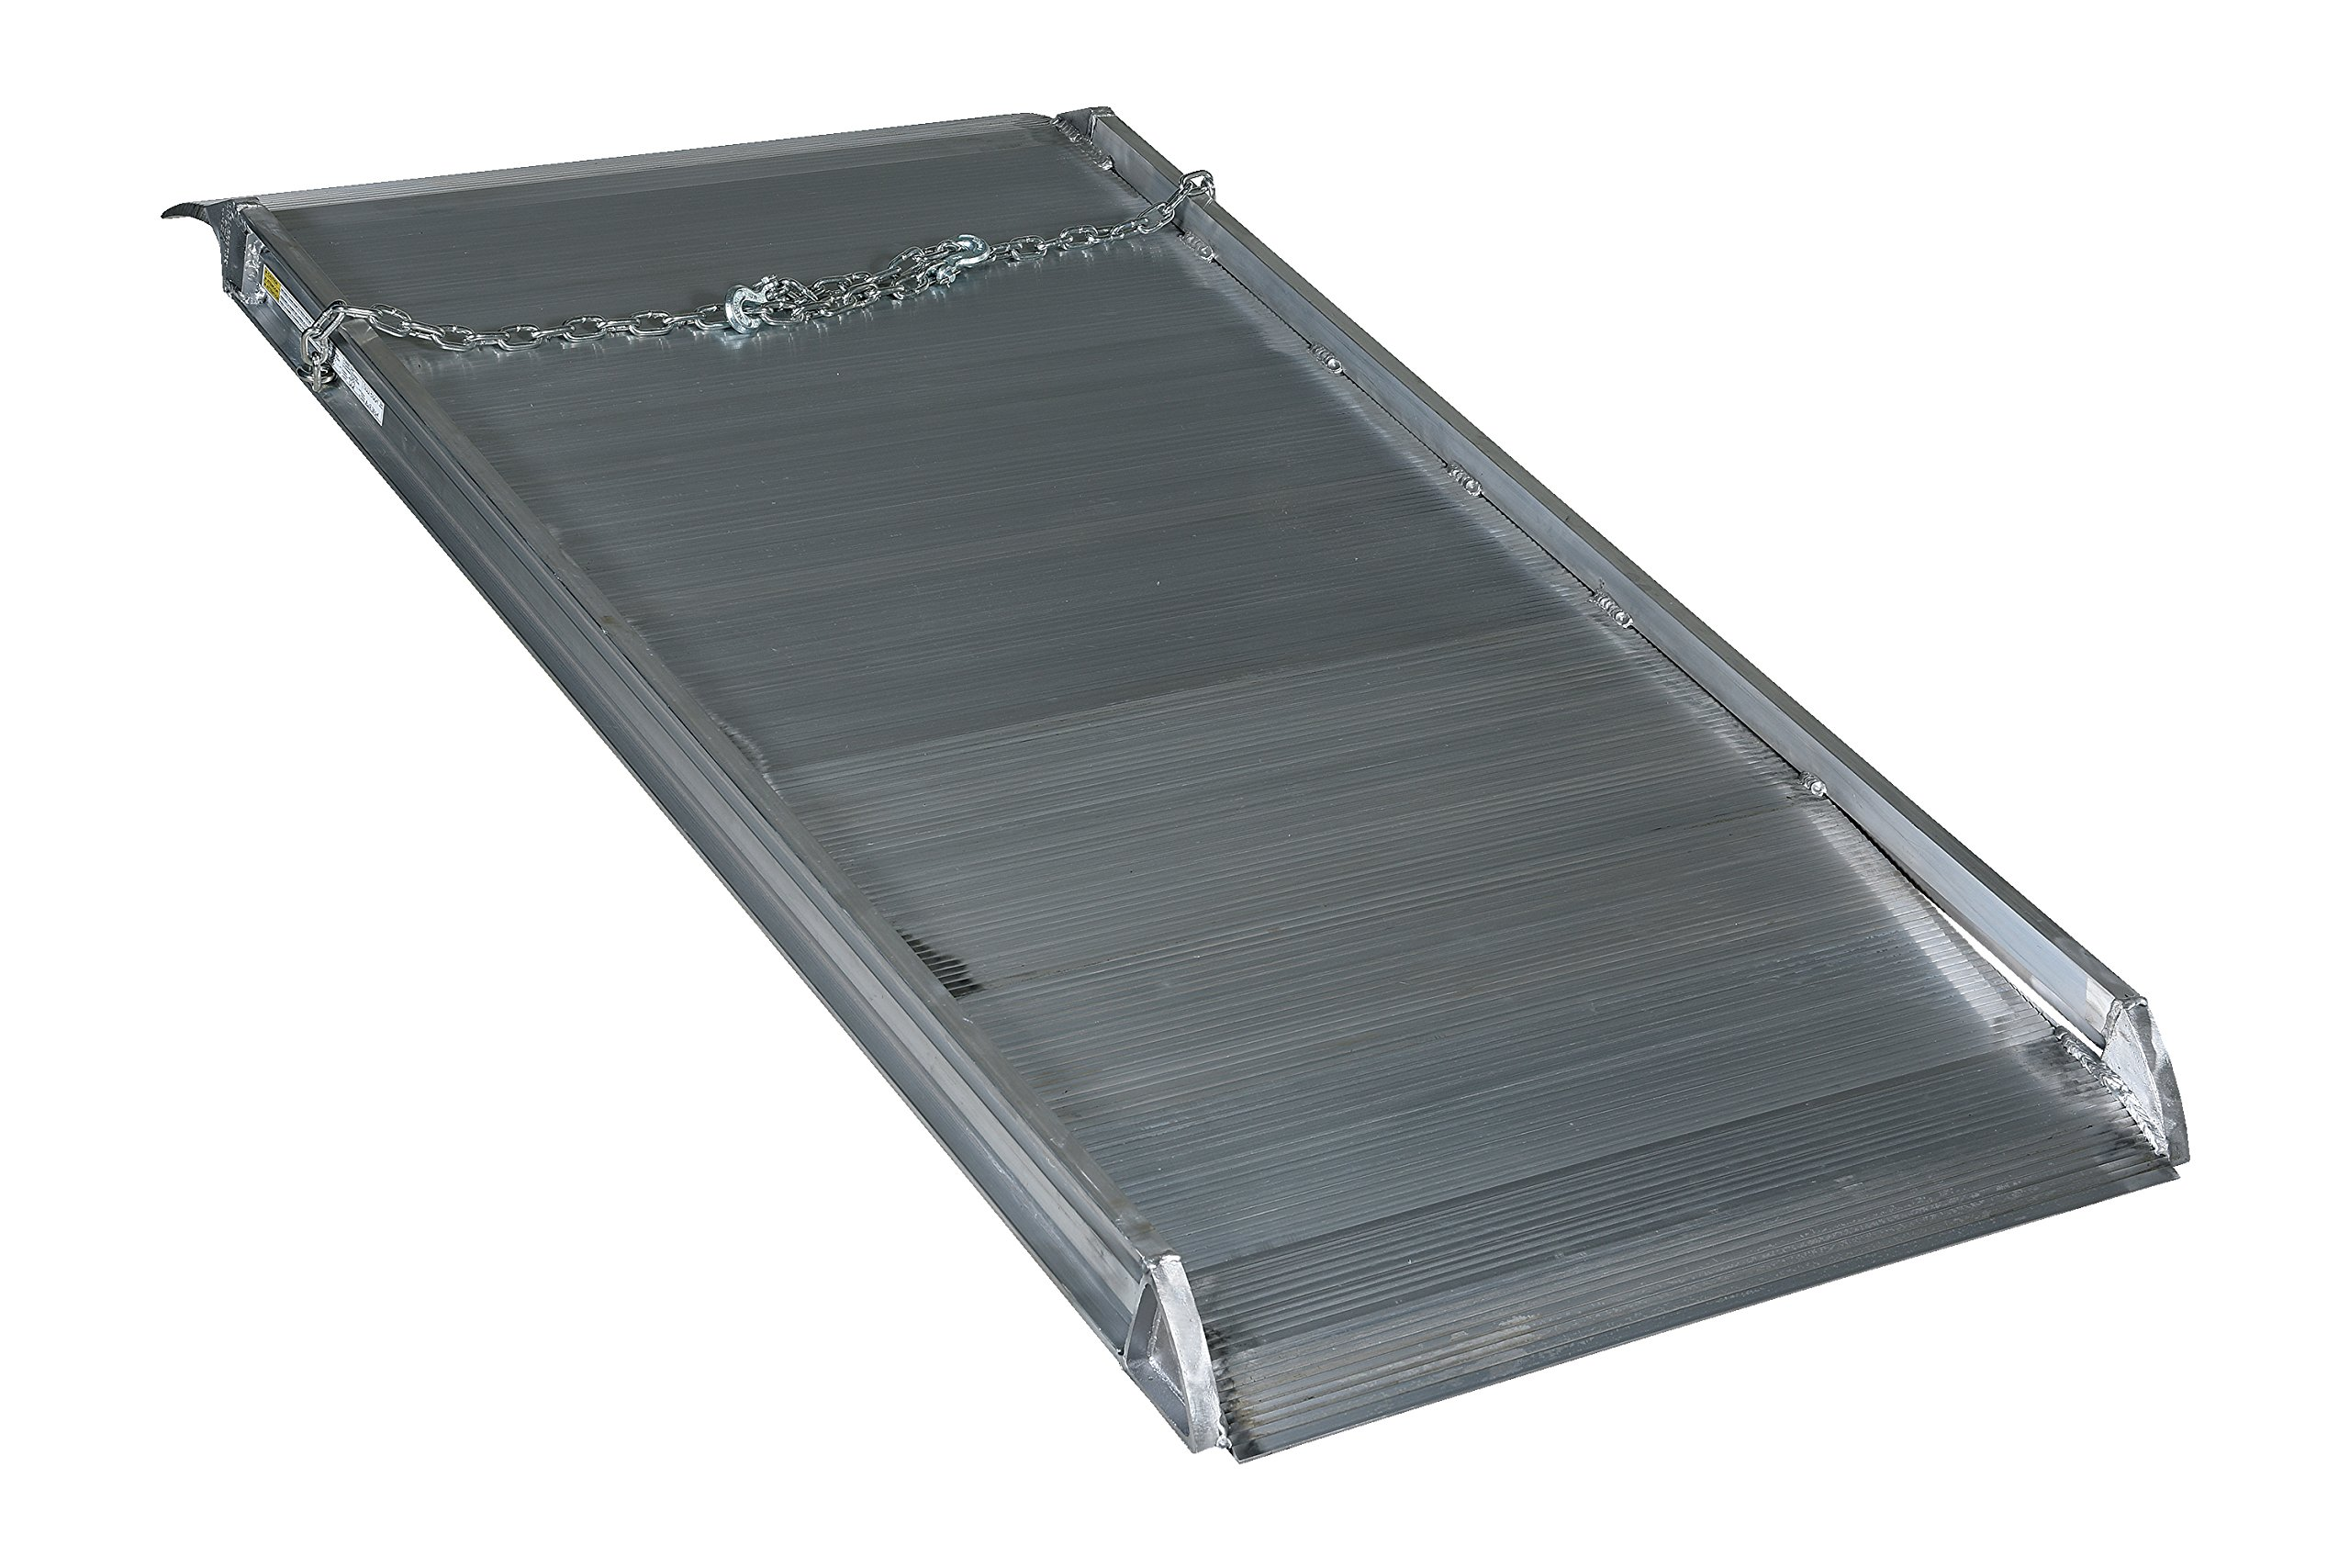 Vestil AWR-38-6A Aluminum Walk Ramp Overlap Style, 2800 lb., 72'' Length, 38'' Width, 4.75'' Height